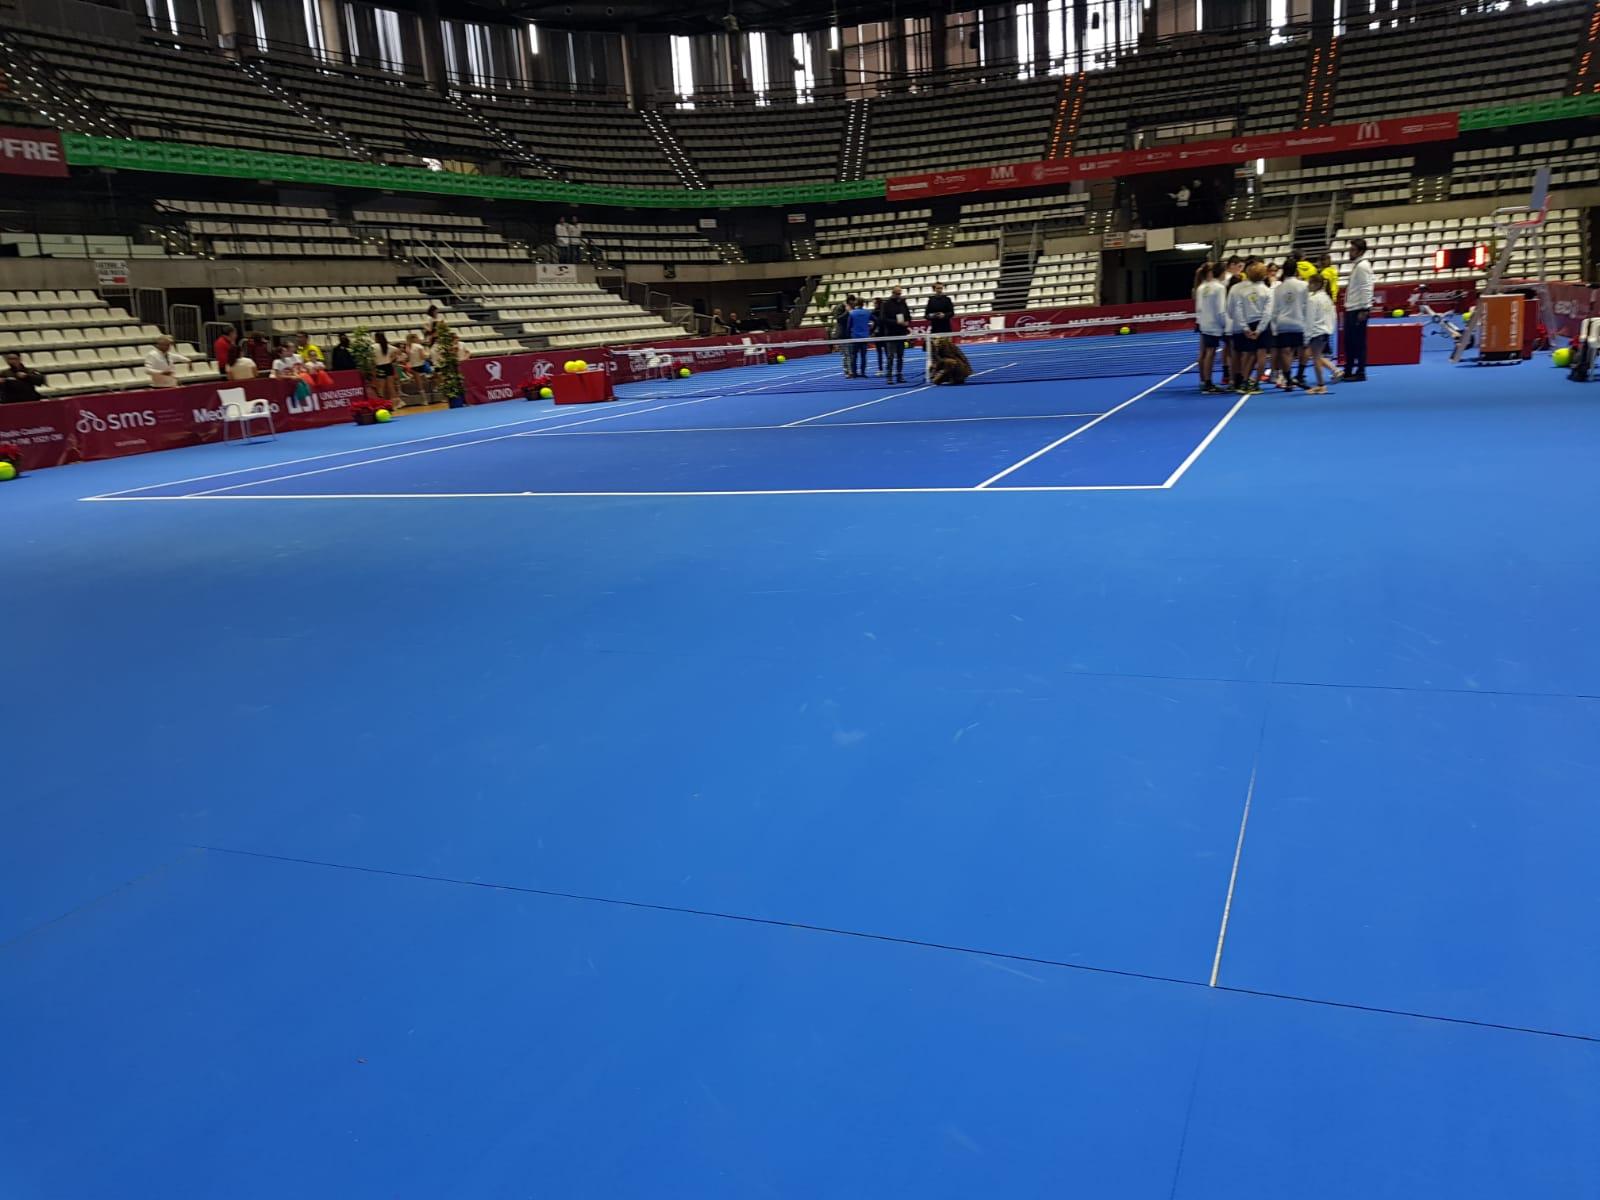 tenis-castellon-07